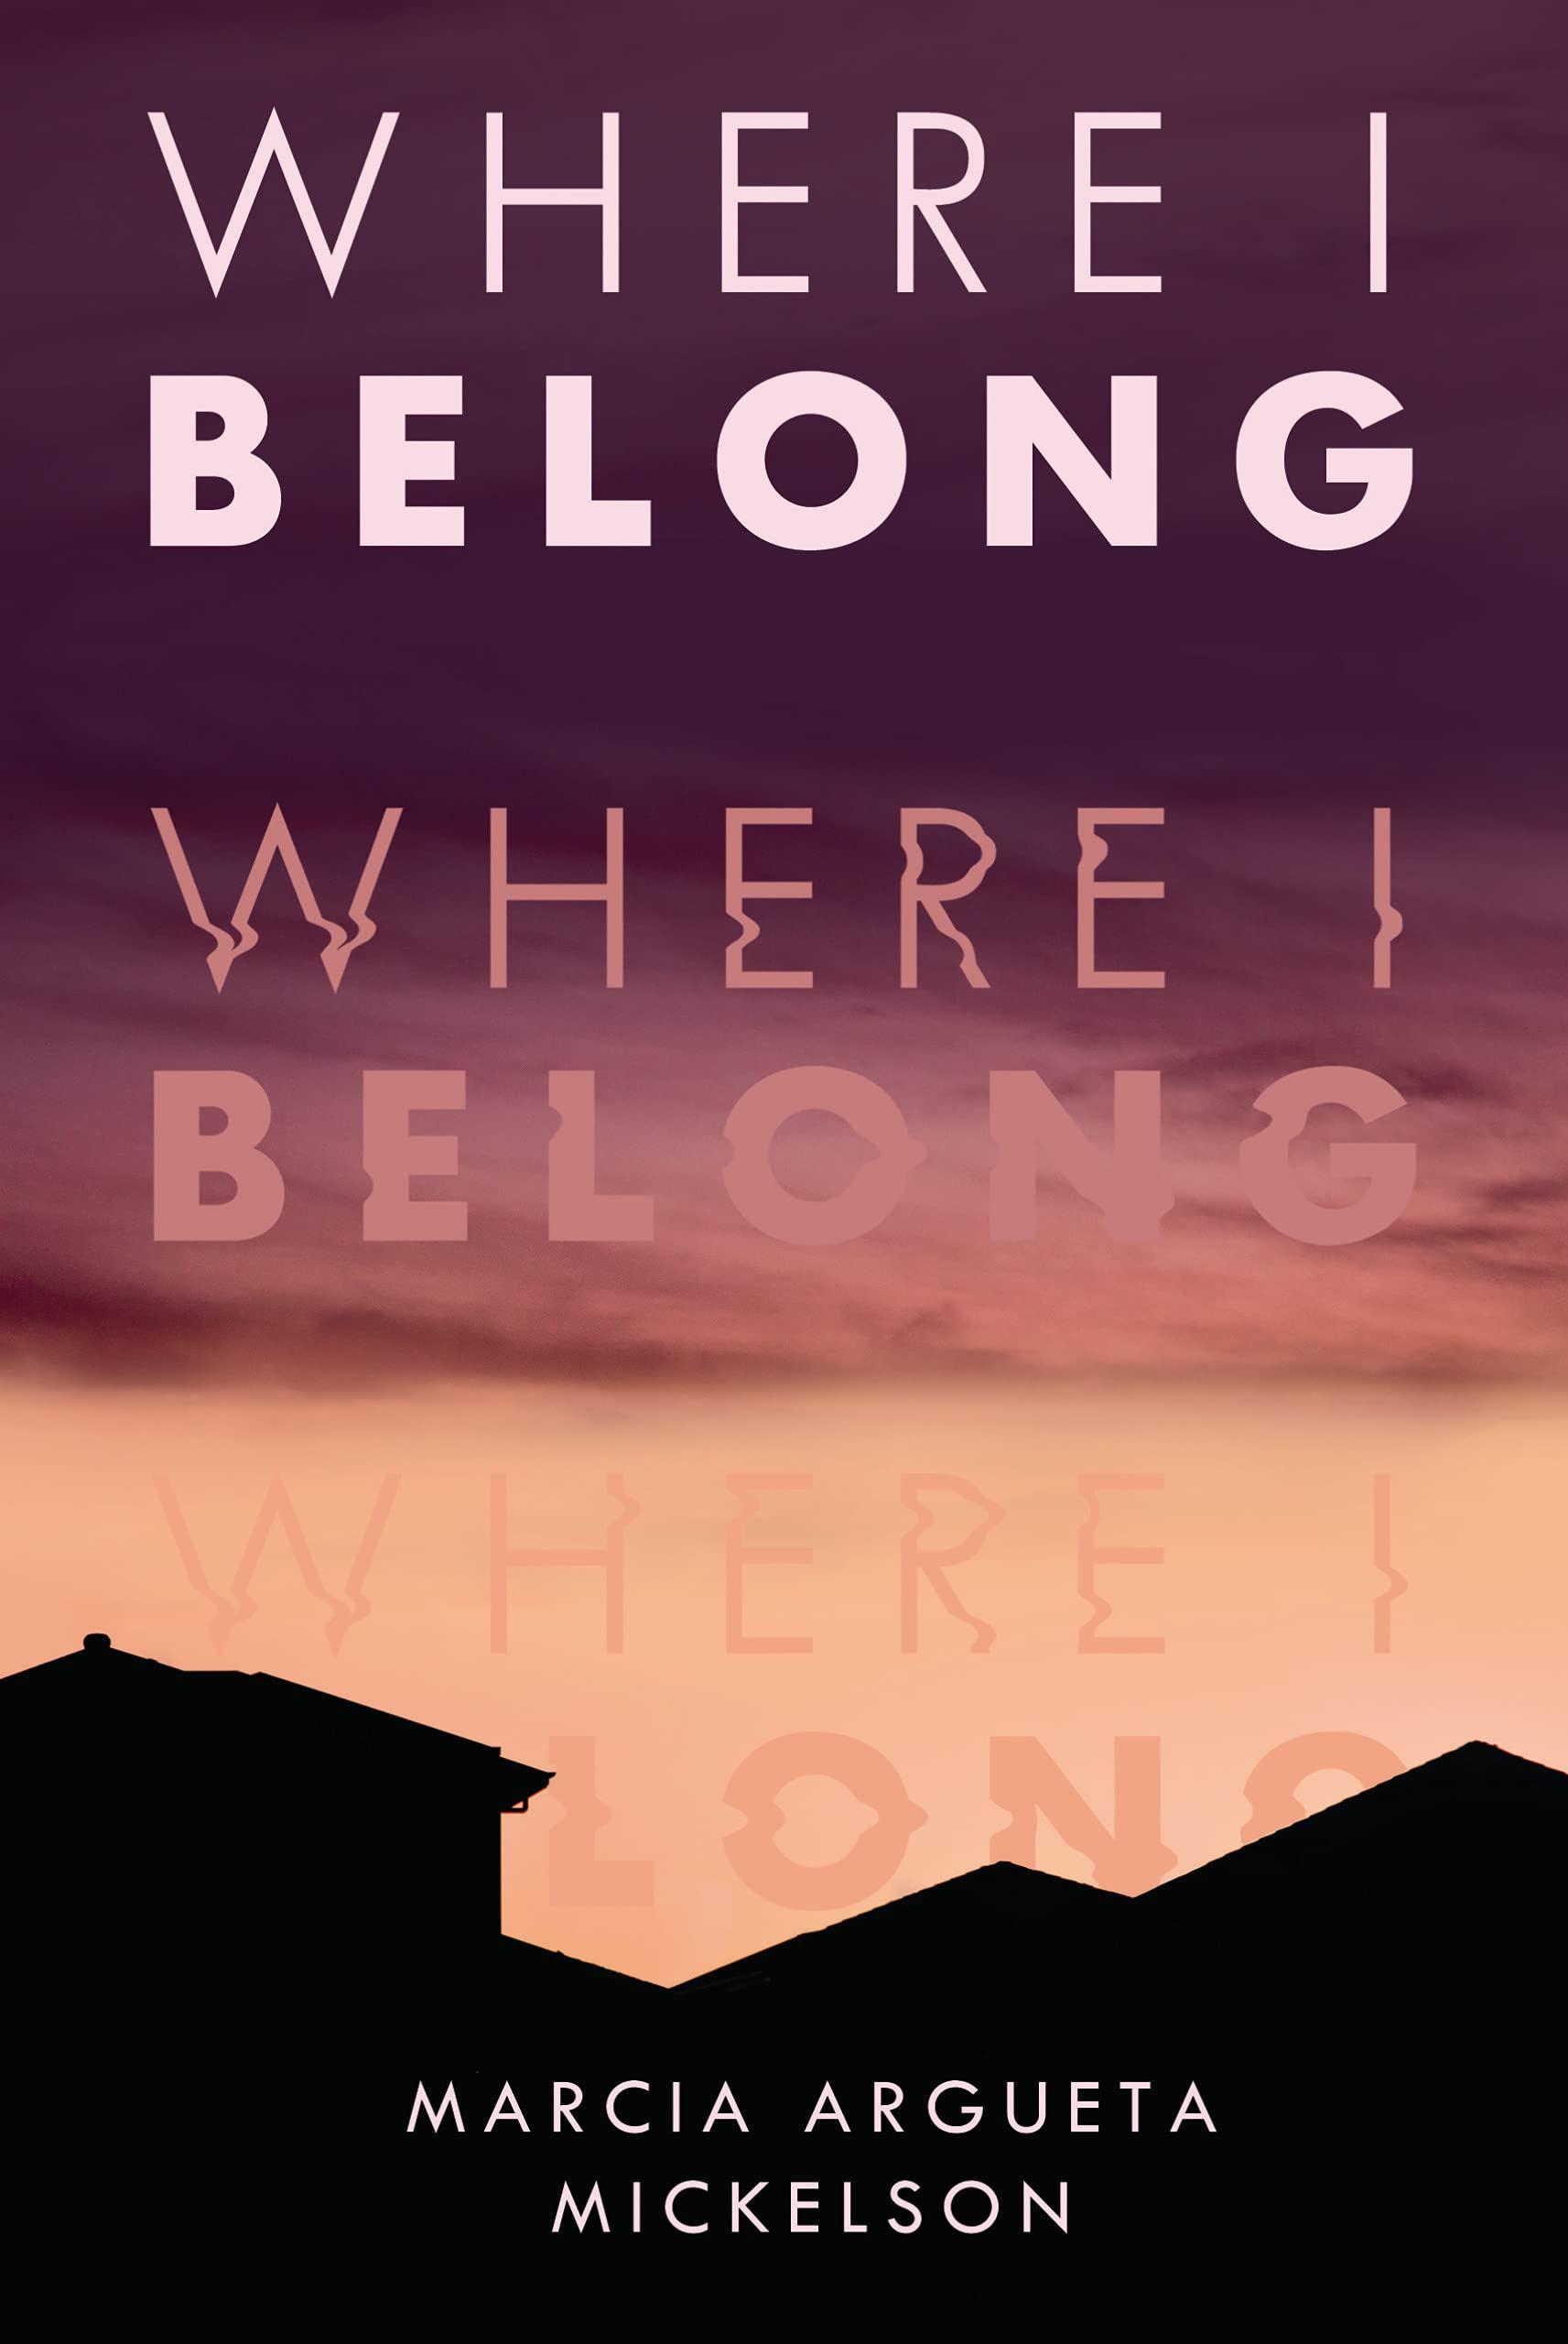 Amazon.com: Where I Belong: 9781541597976: Mickelson, Marcia Argueta: Books